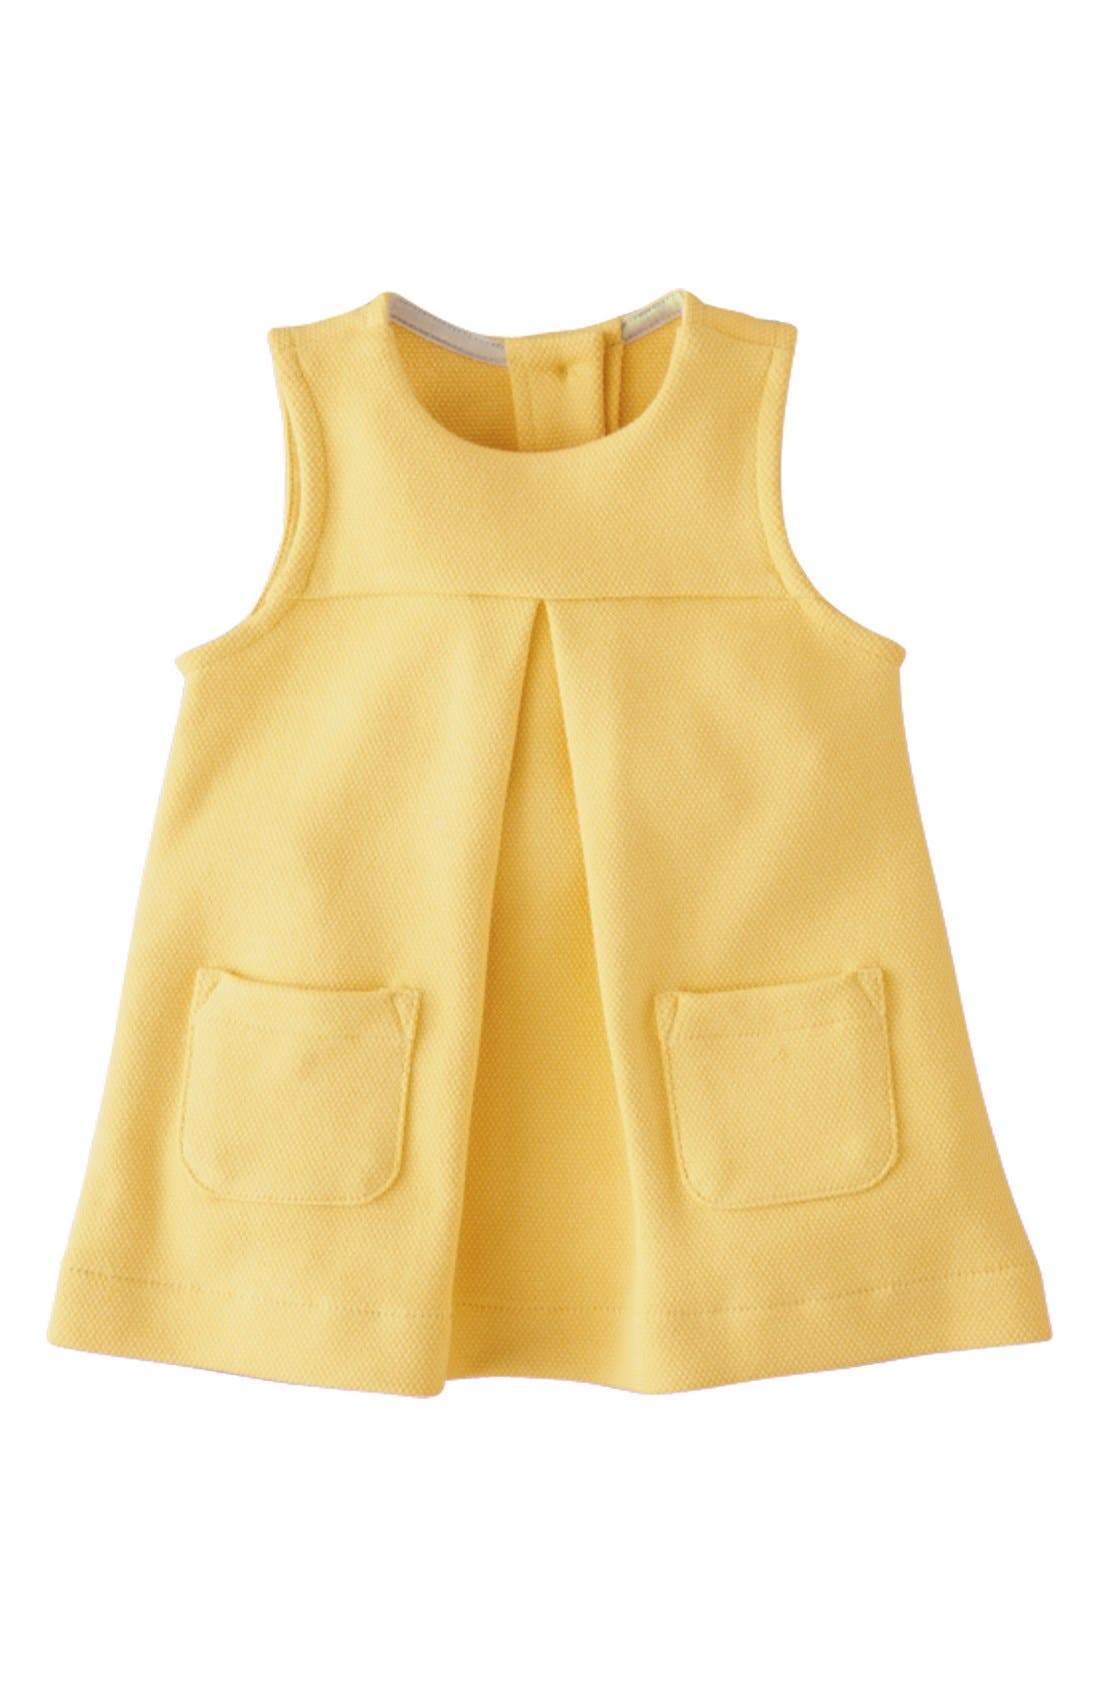 Alternate Image 1 Selected - Mini Boden Jersey Pinafore Dress (Baby Girls)